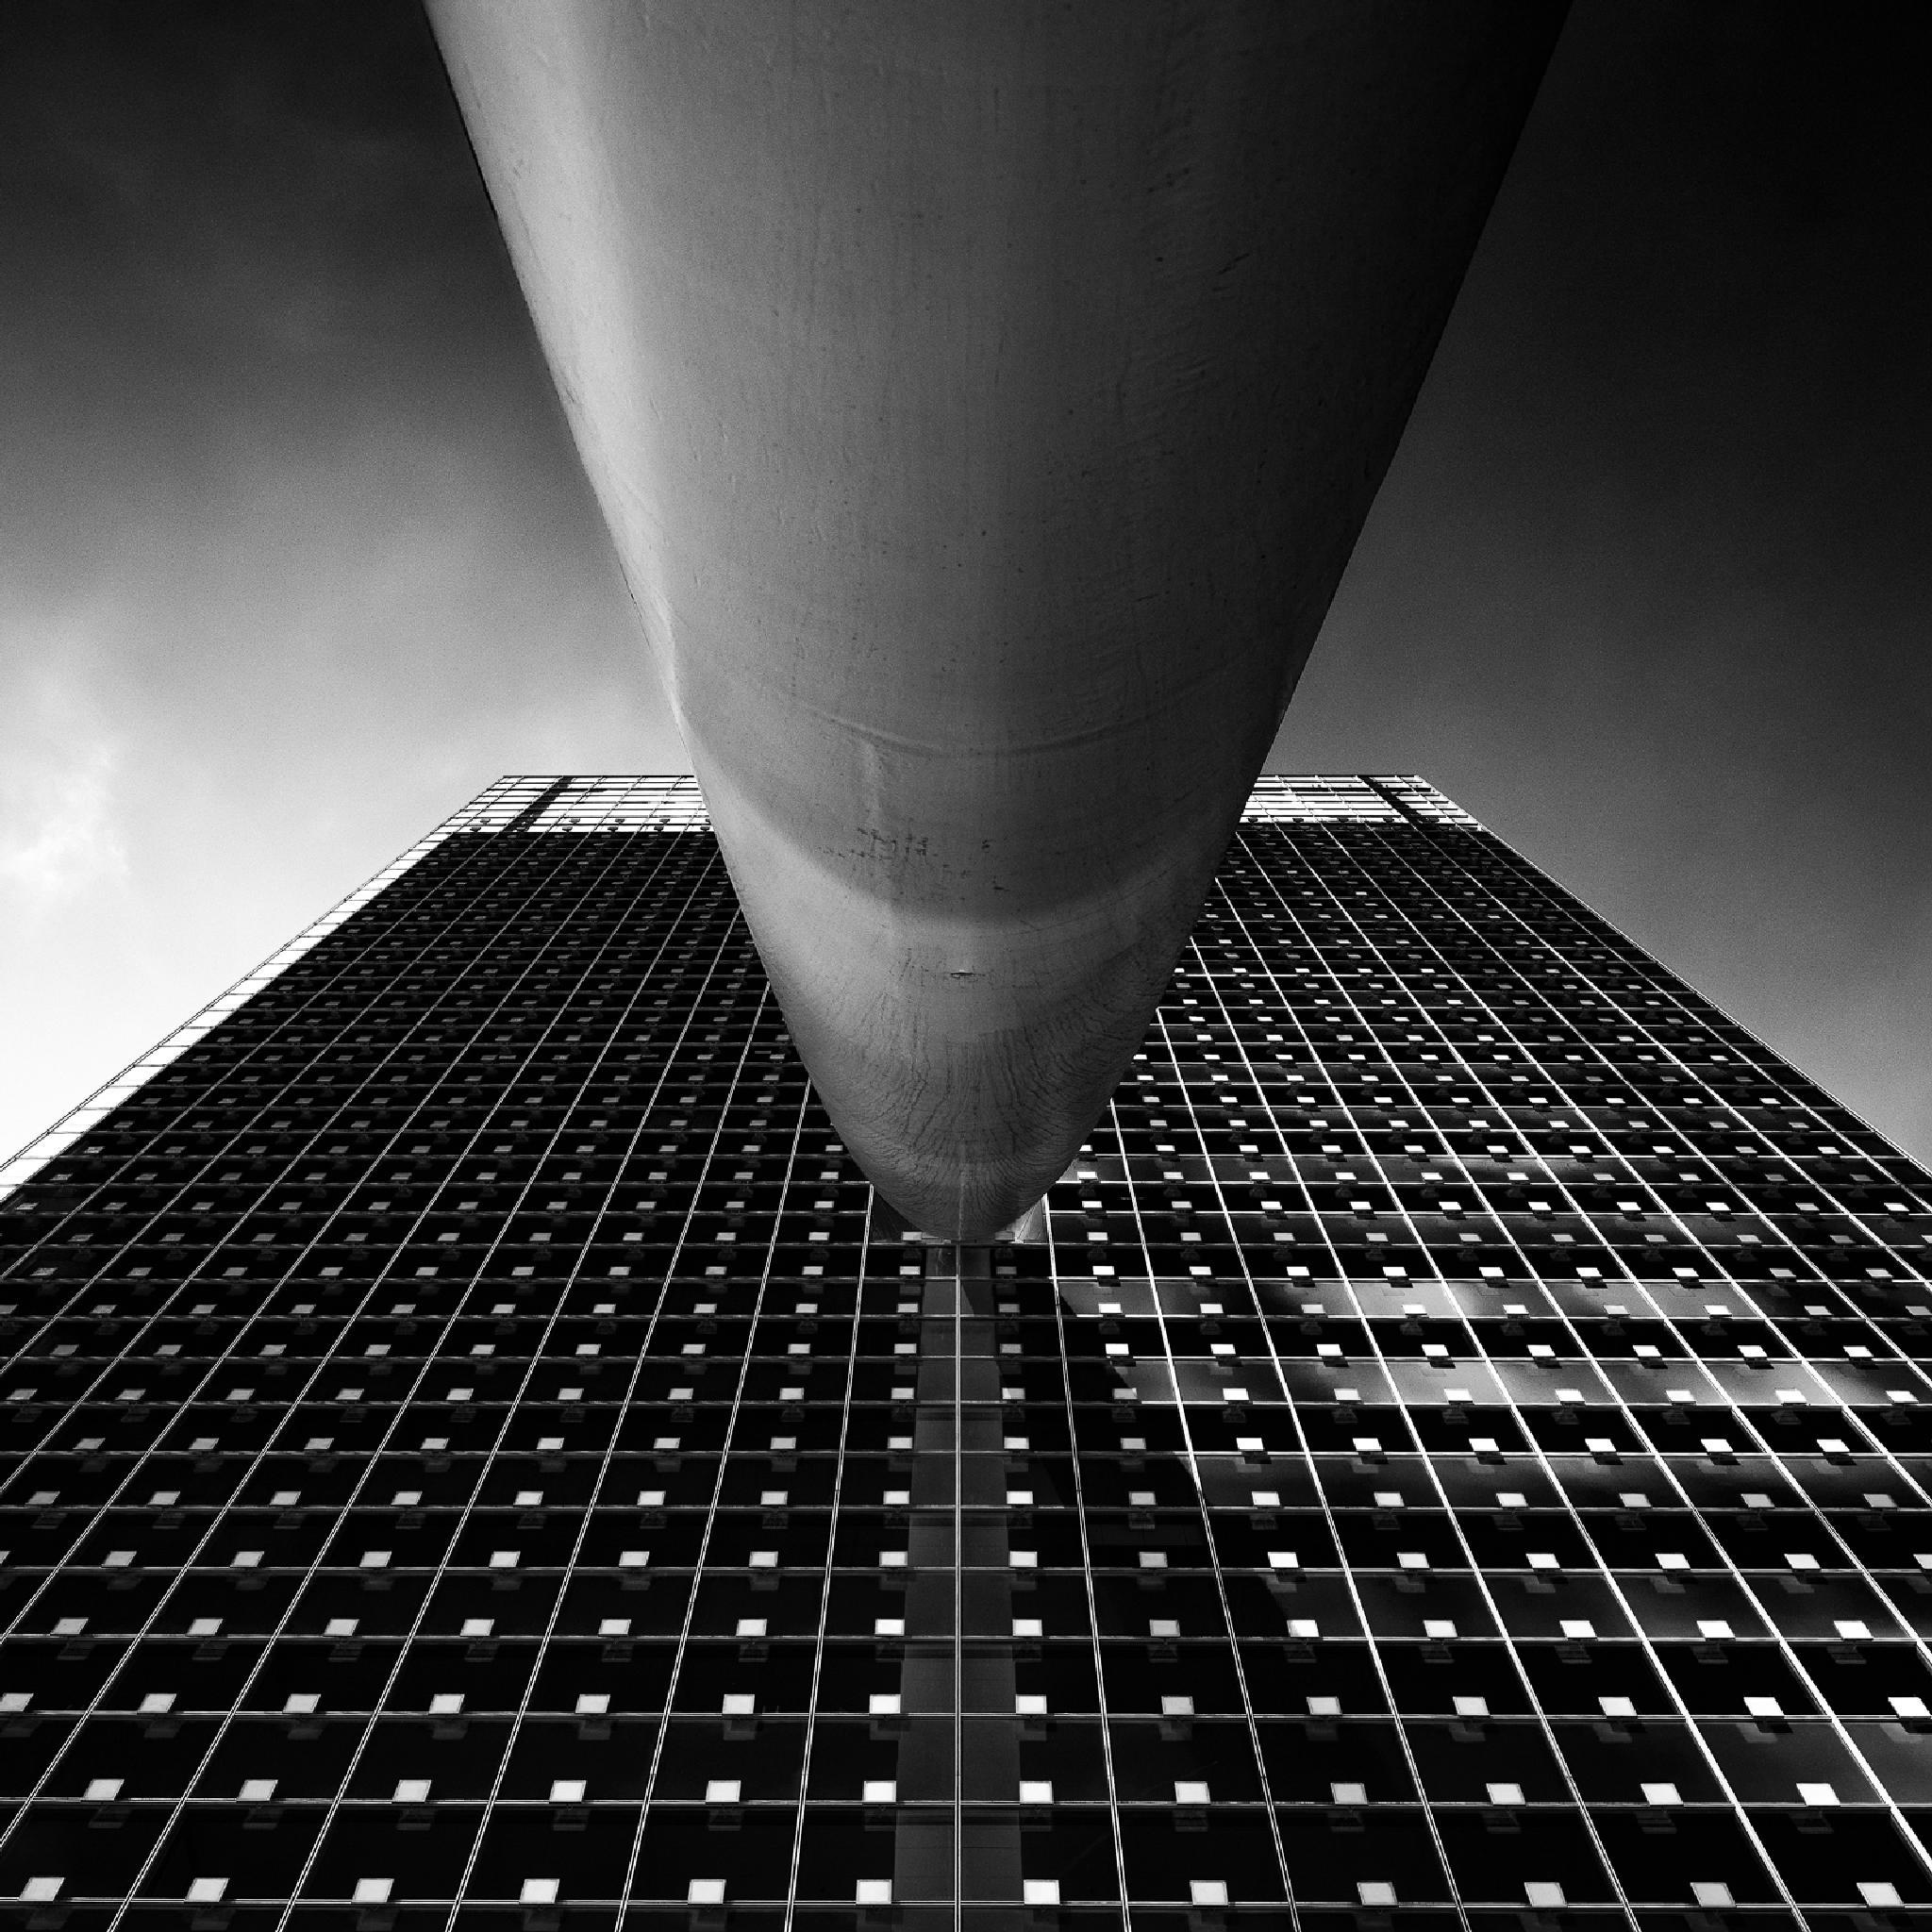 KPN Building by marcel.vanoostrom